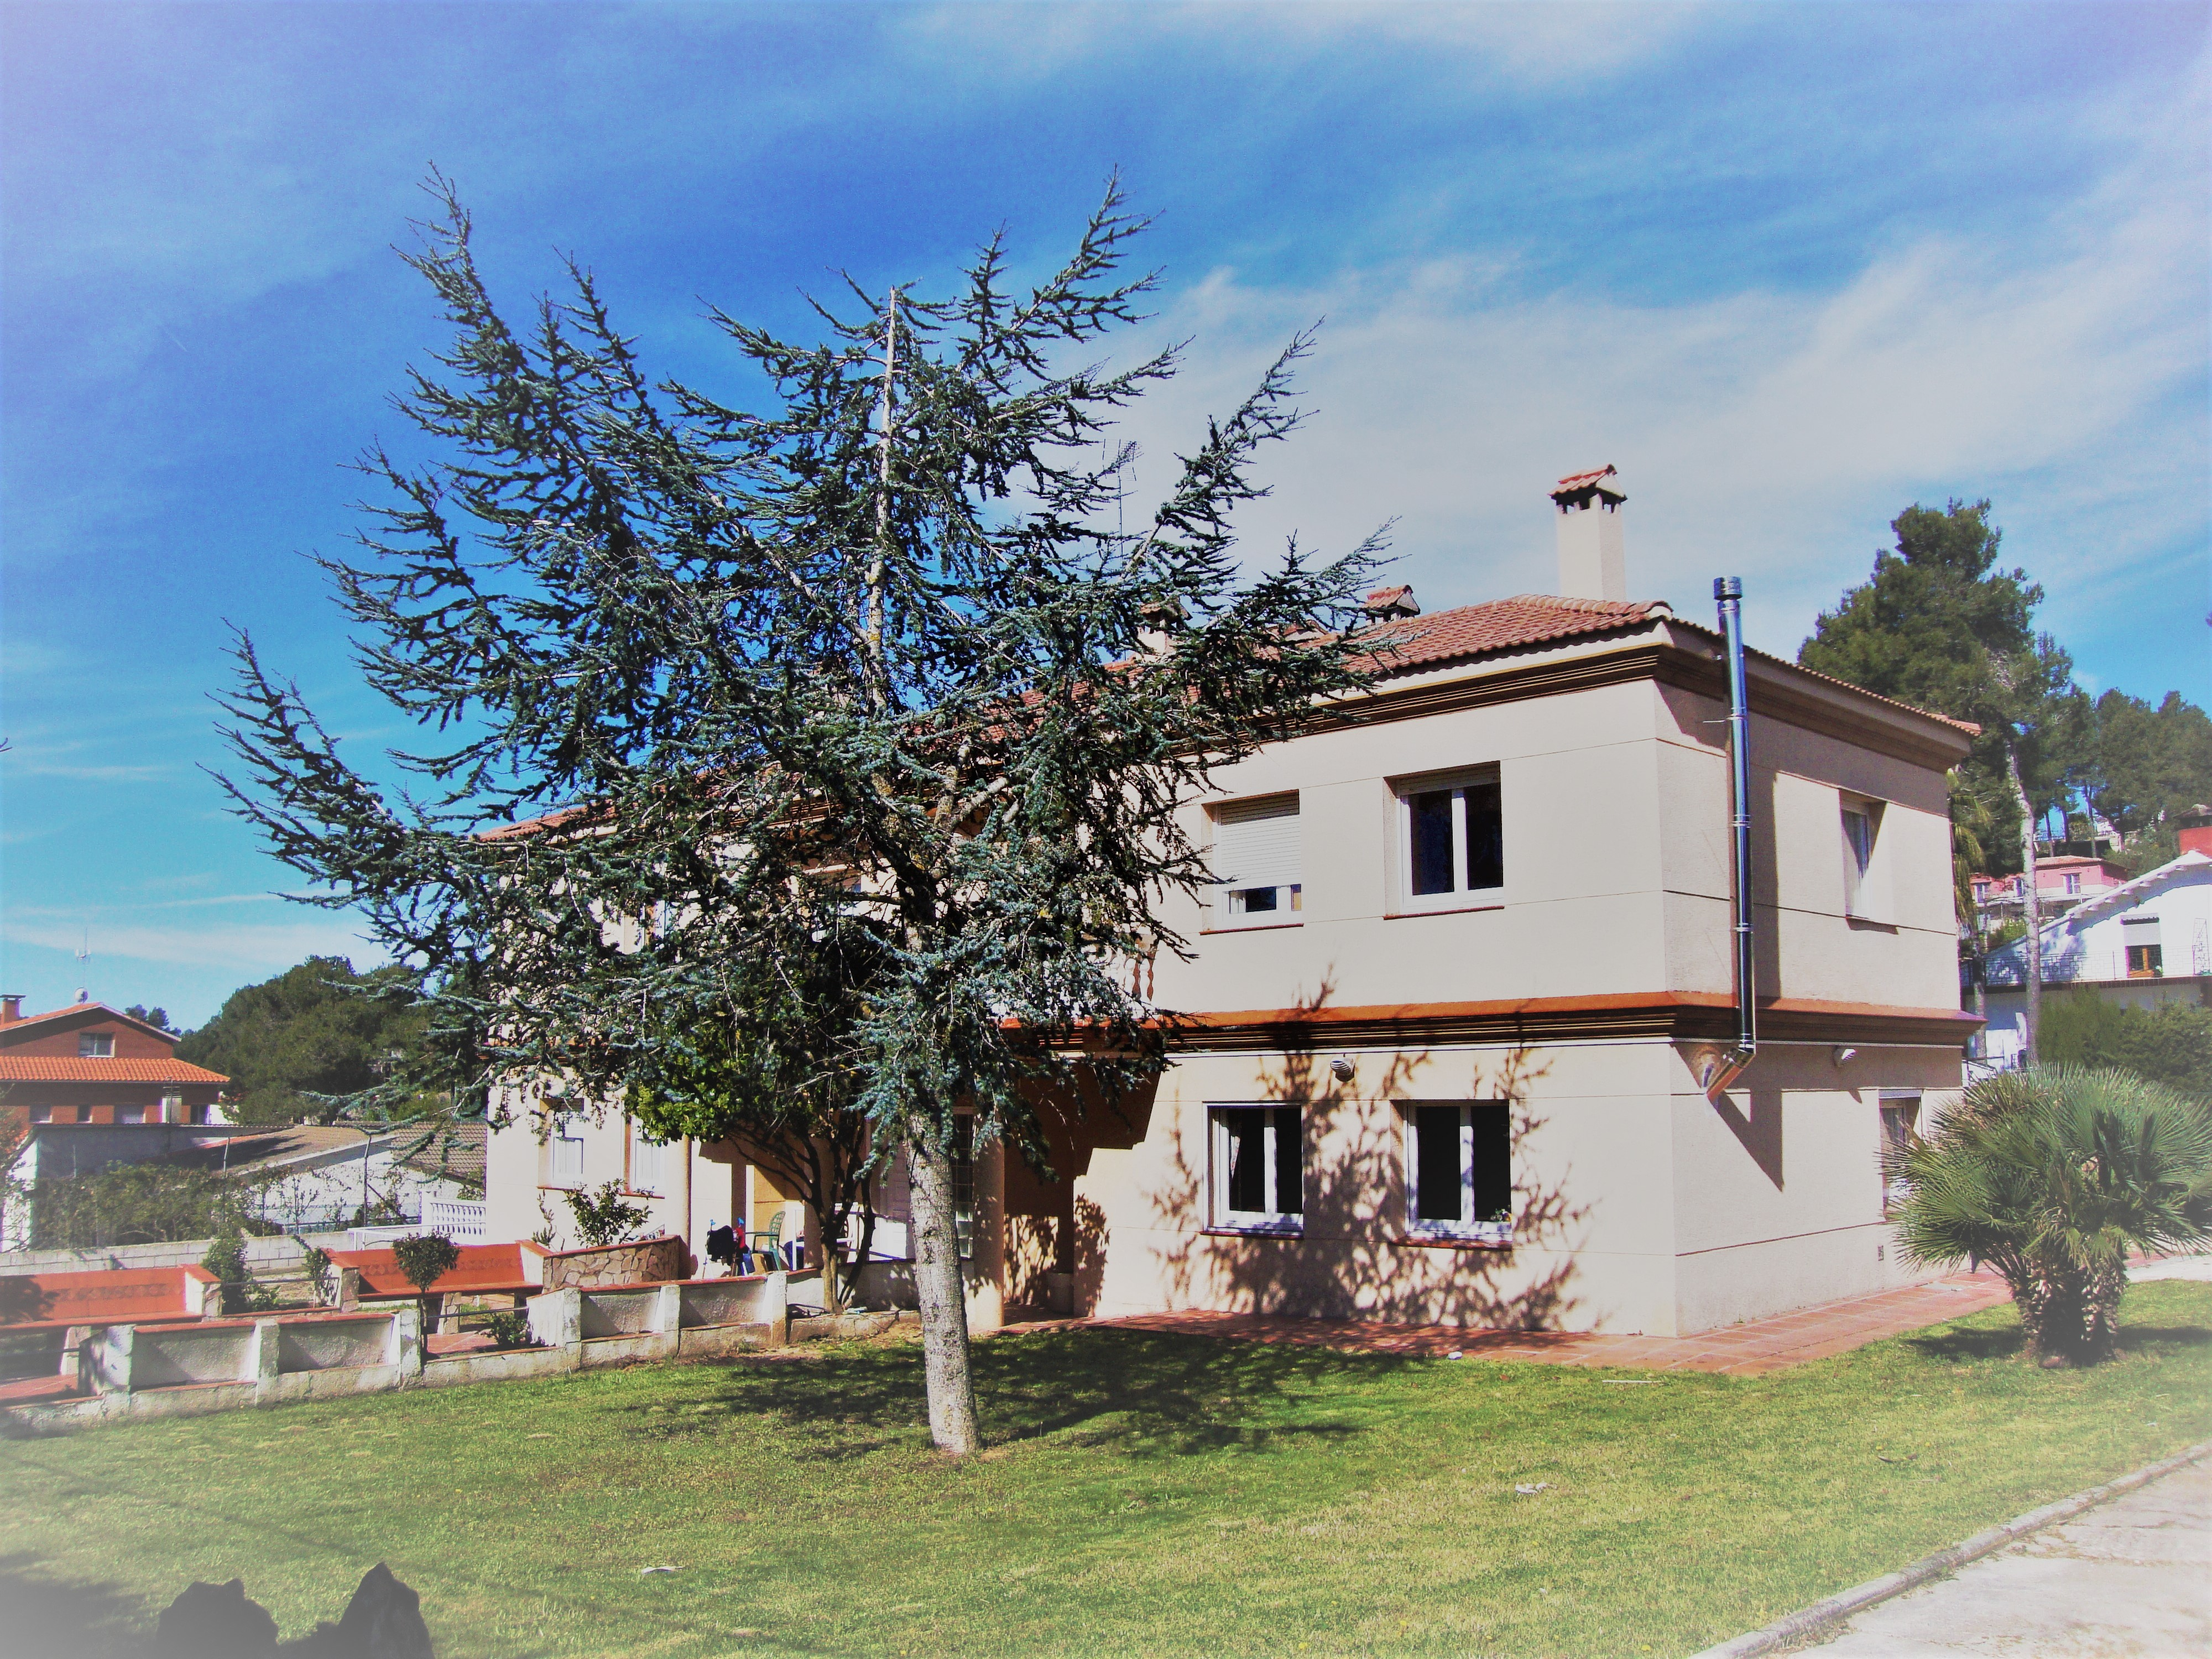 Residencia_El_Petit_Hostalet_Exterior_1